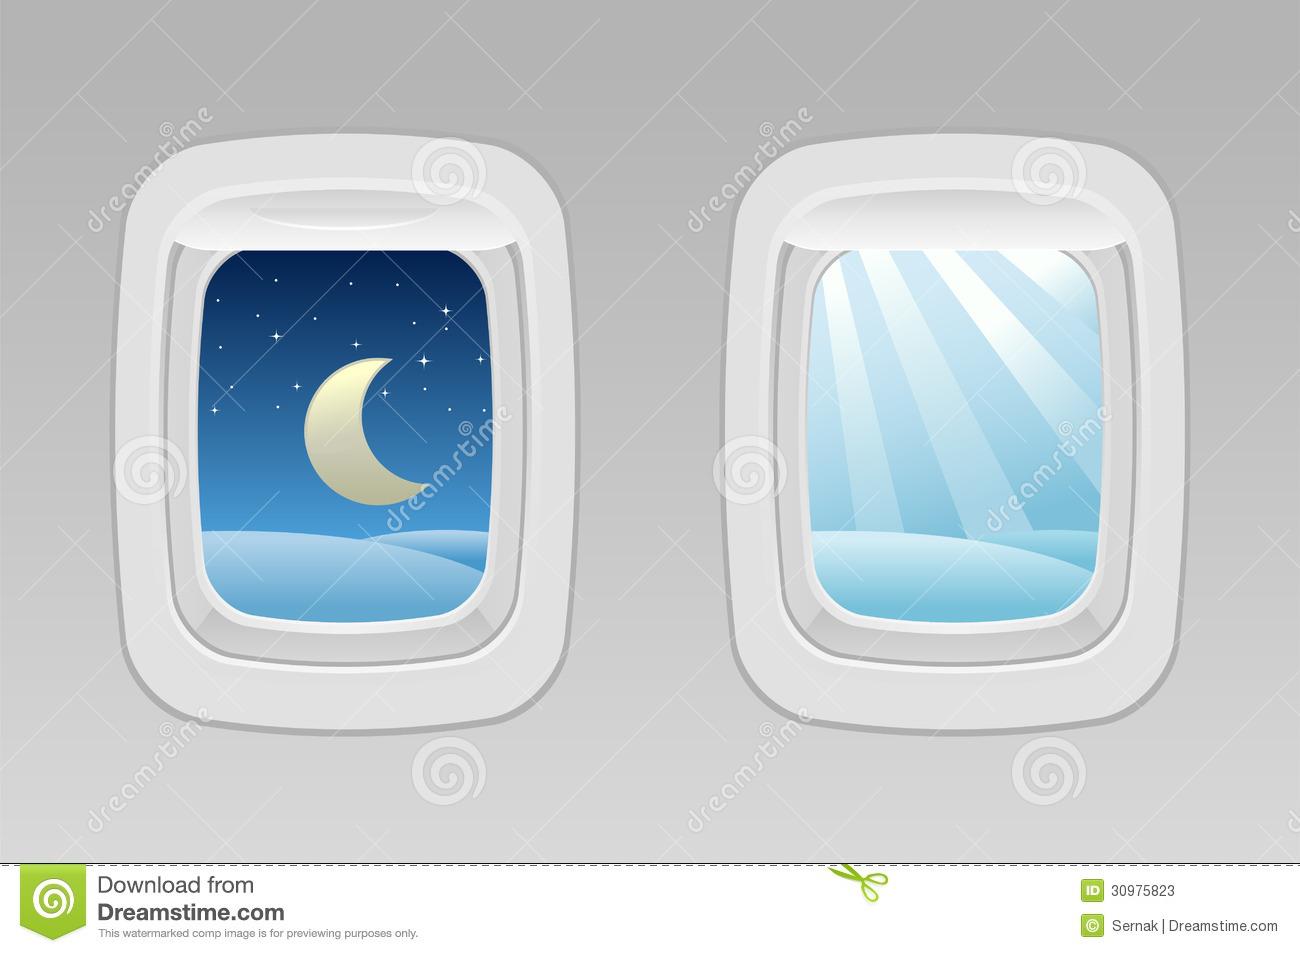 Airplane window clipart #20